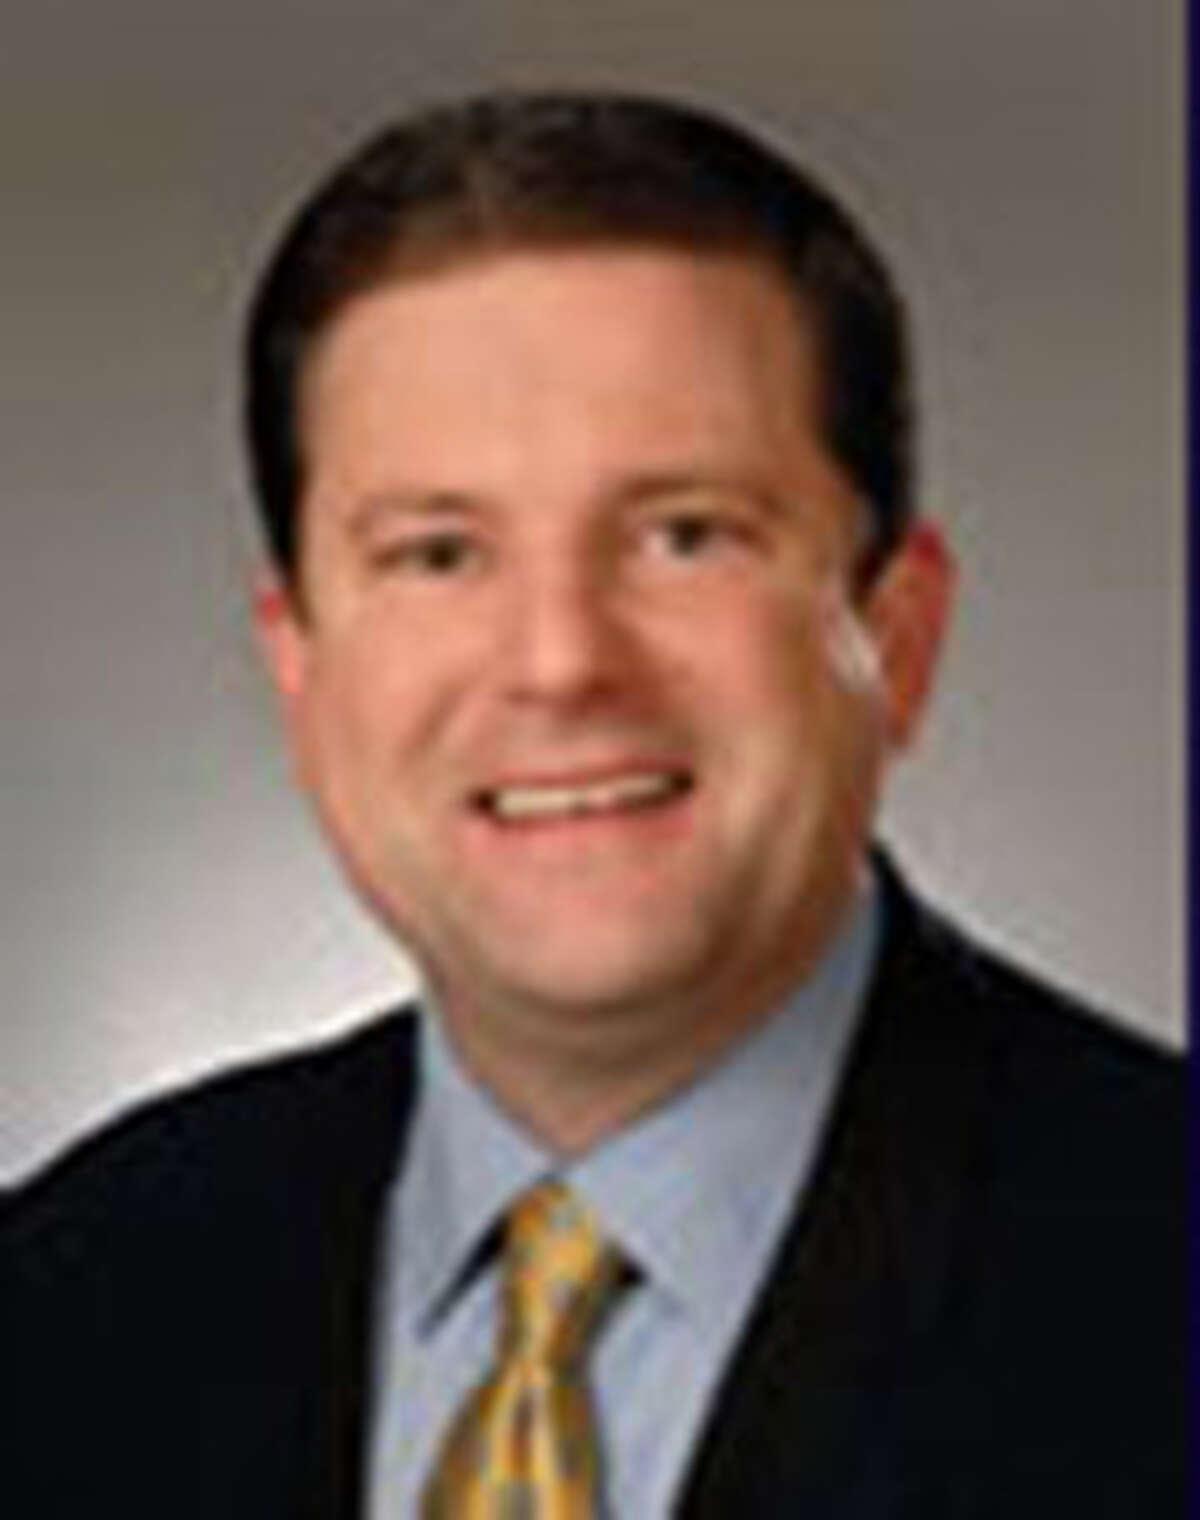 State Senate Minority Leader John P. McKinney.